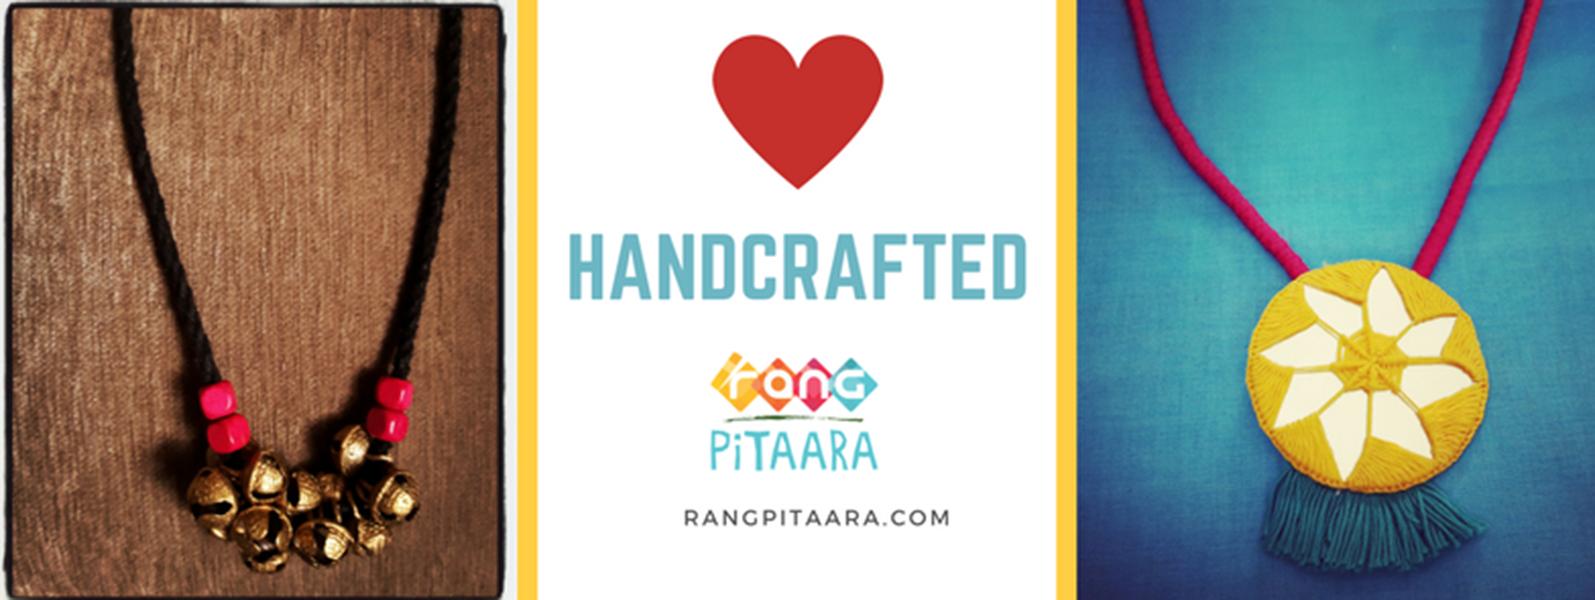 handcrafted-rangpitaara